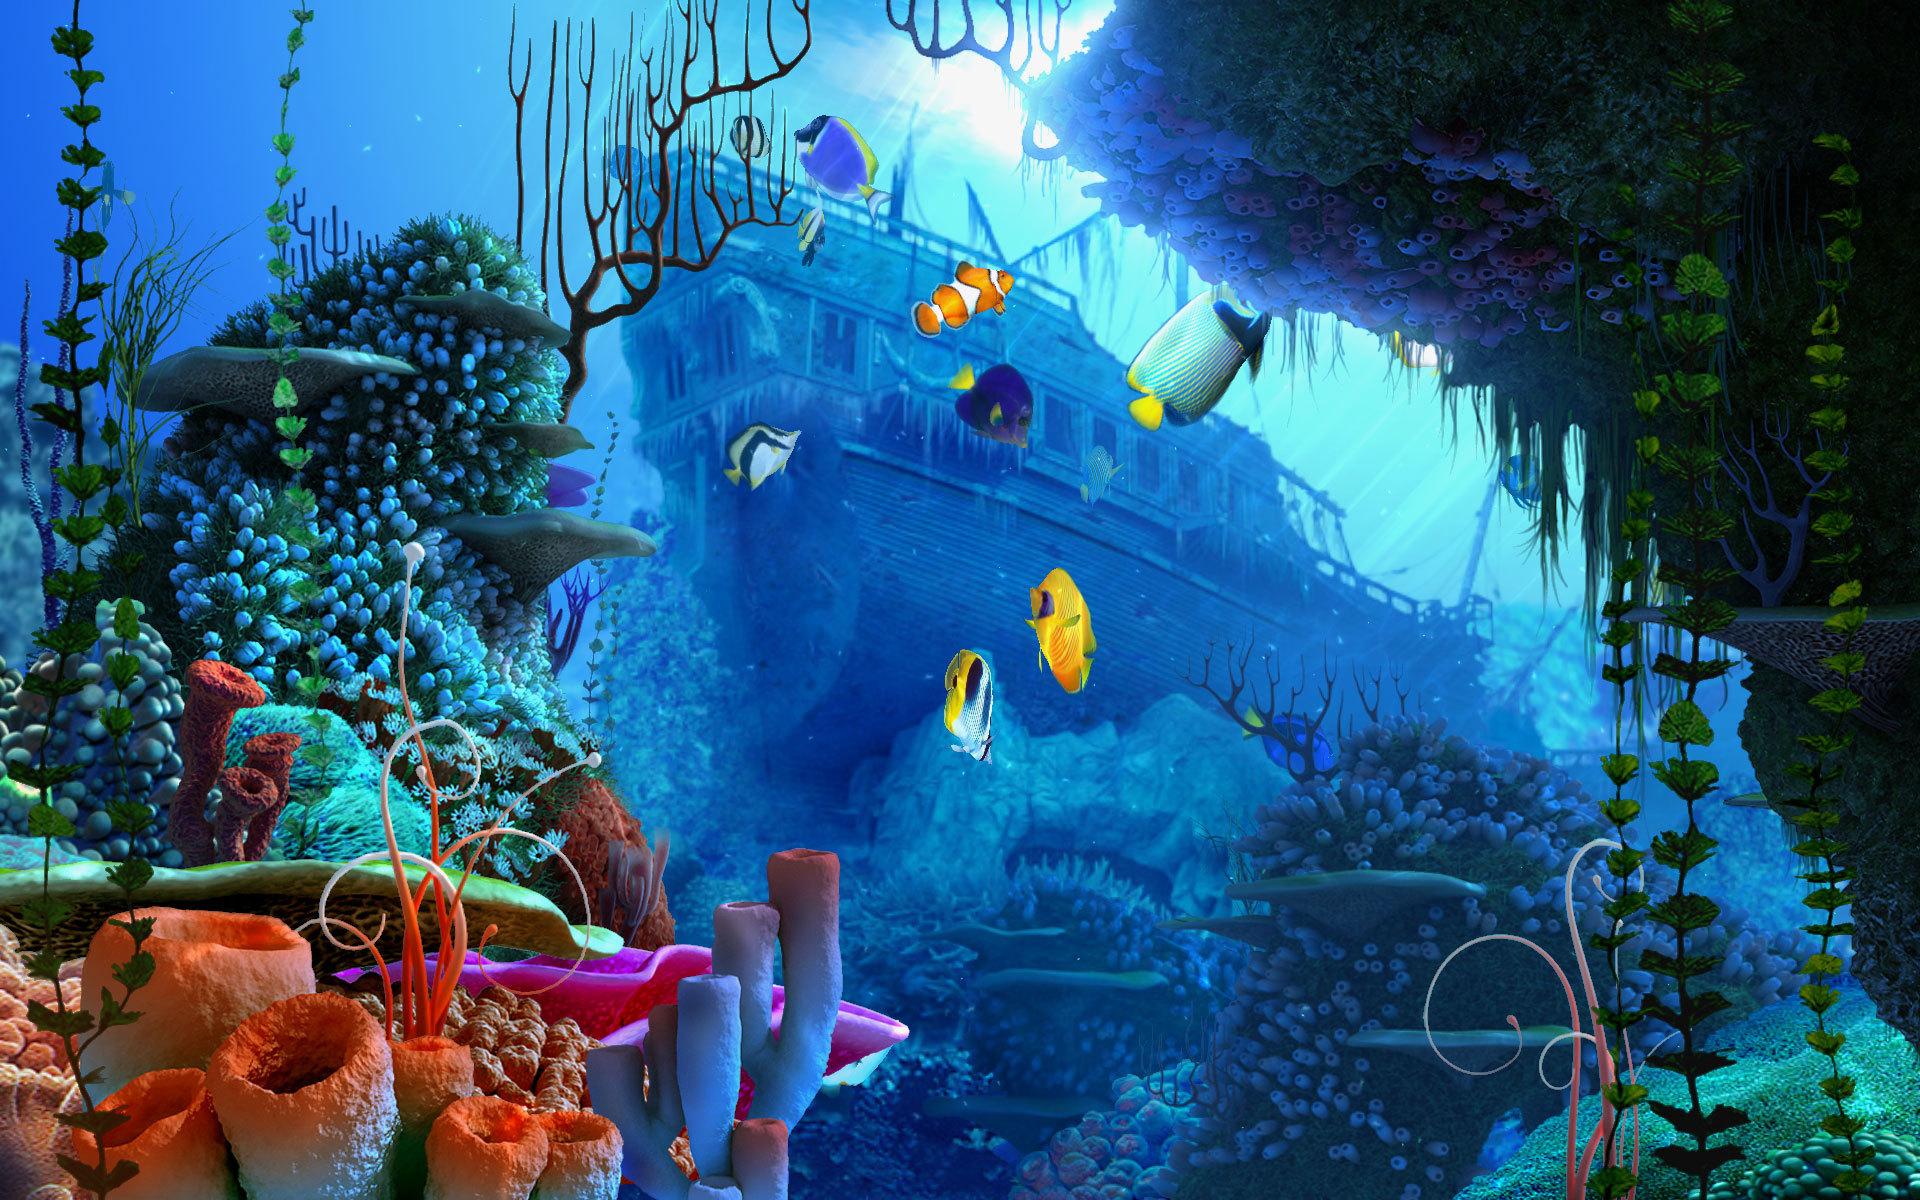 Screen Savers Screensaver Aquarium Coral Screensavers Wallpaper 156148 1920x1200